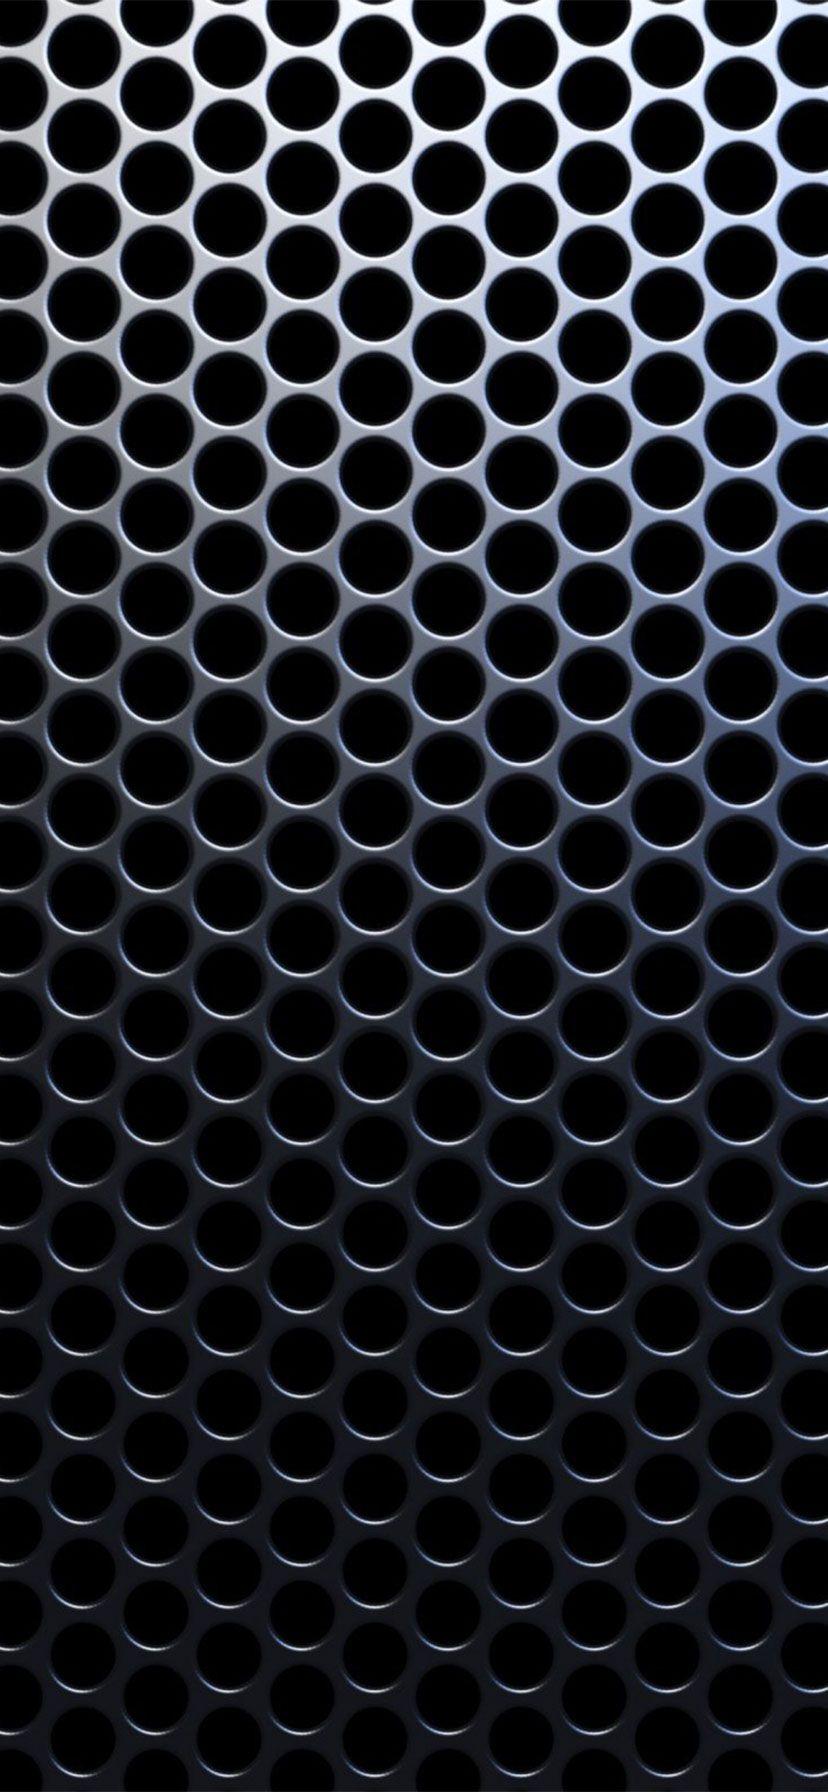 iPhone Xr Black 4k Wallpapers - Wallpaper Cave